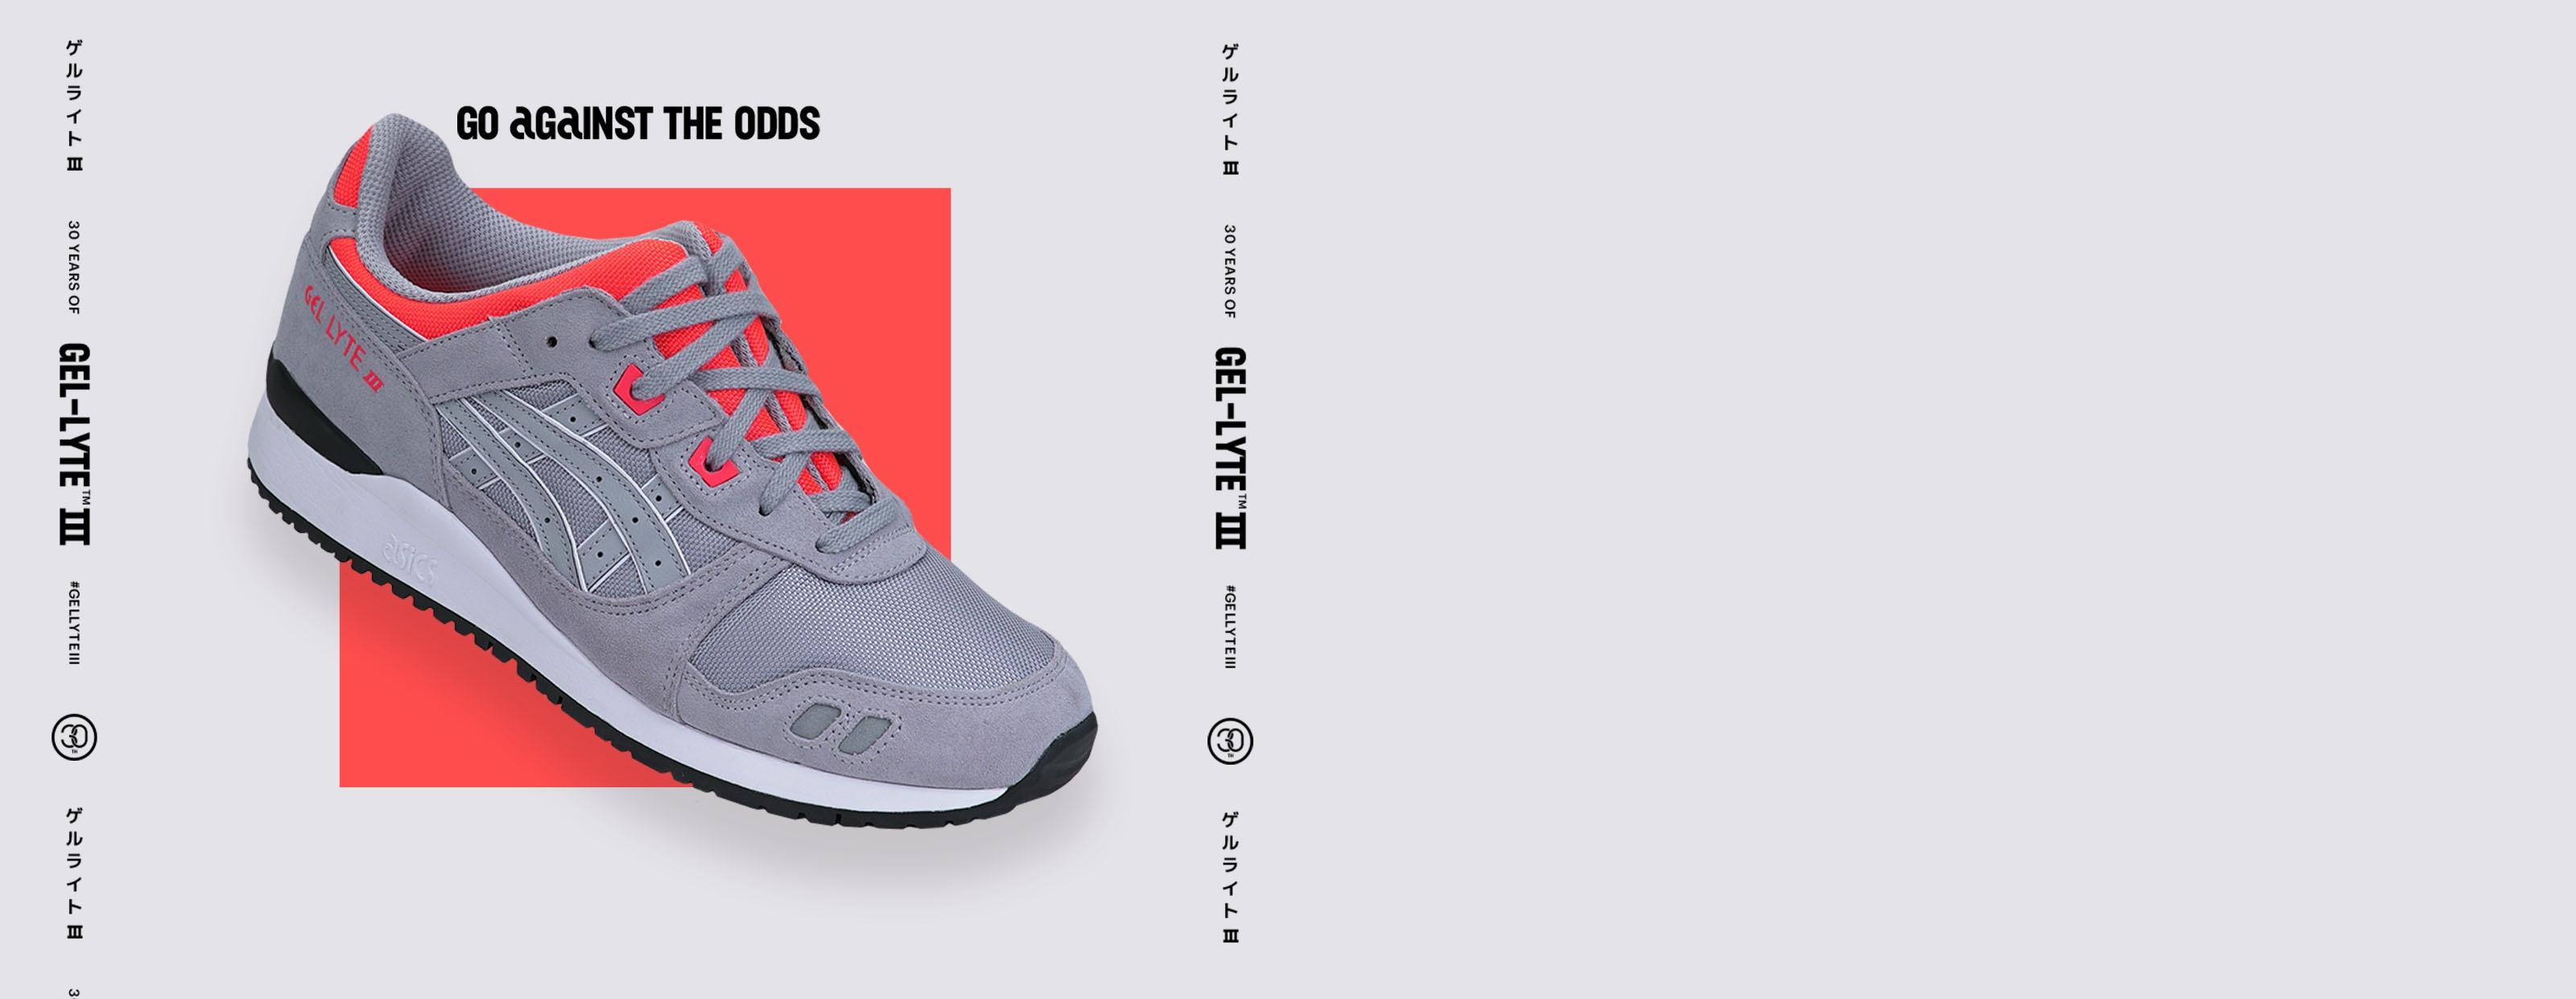 Grey Gel-Lyte III shoe on grey background.